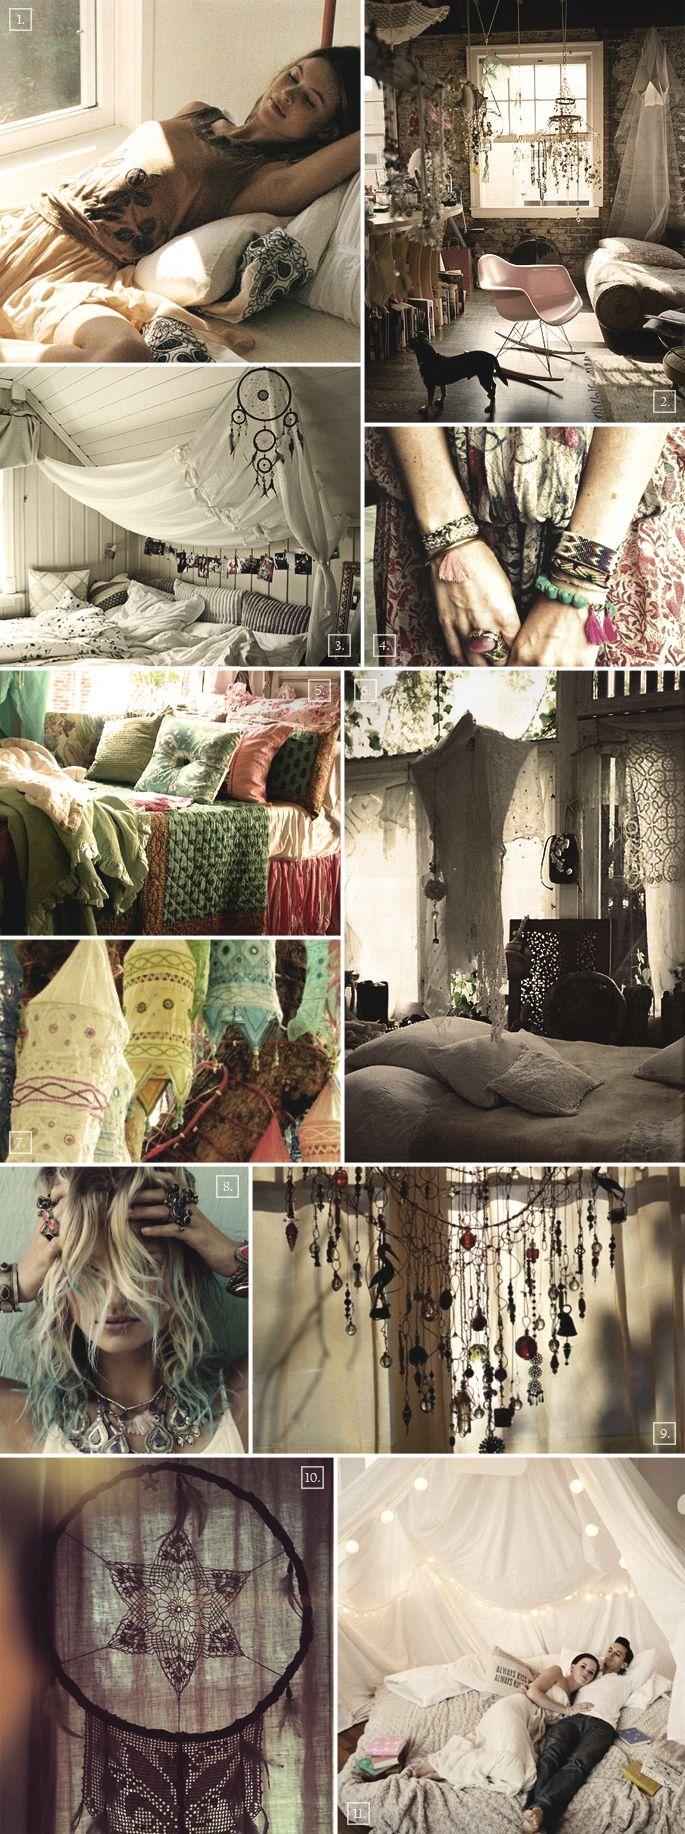 Bohemian Bedroom - http://www.hood-scoop.com/3550/bohemian-bedroom #homeideas #homedesign #homedecor